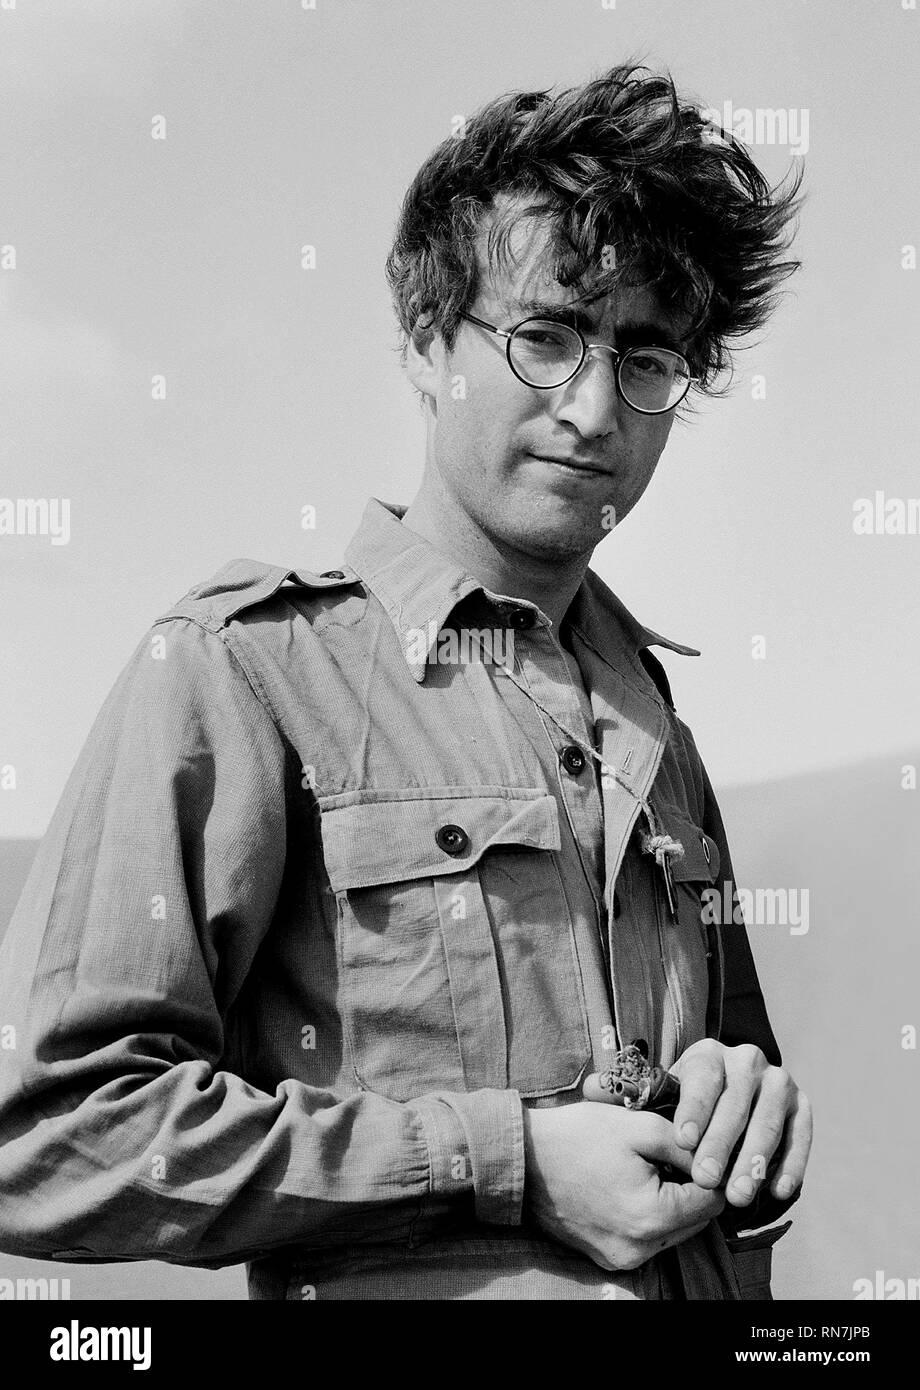 JOHN LENNON, Cómo gané la guerra, 1967 Foto de stock